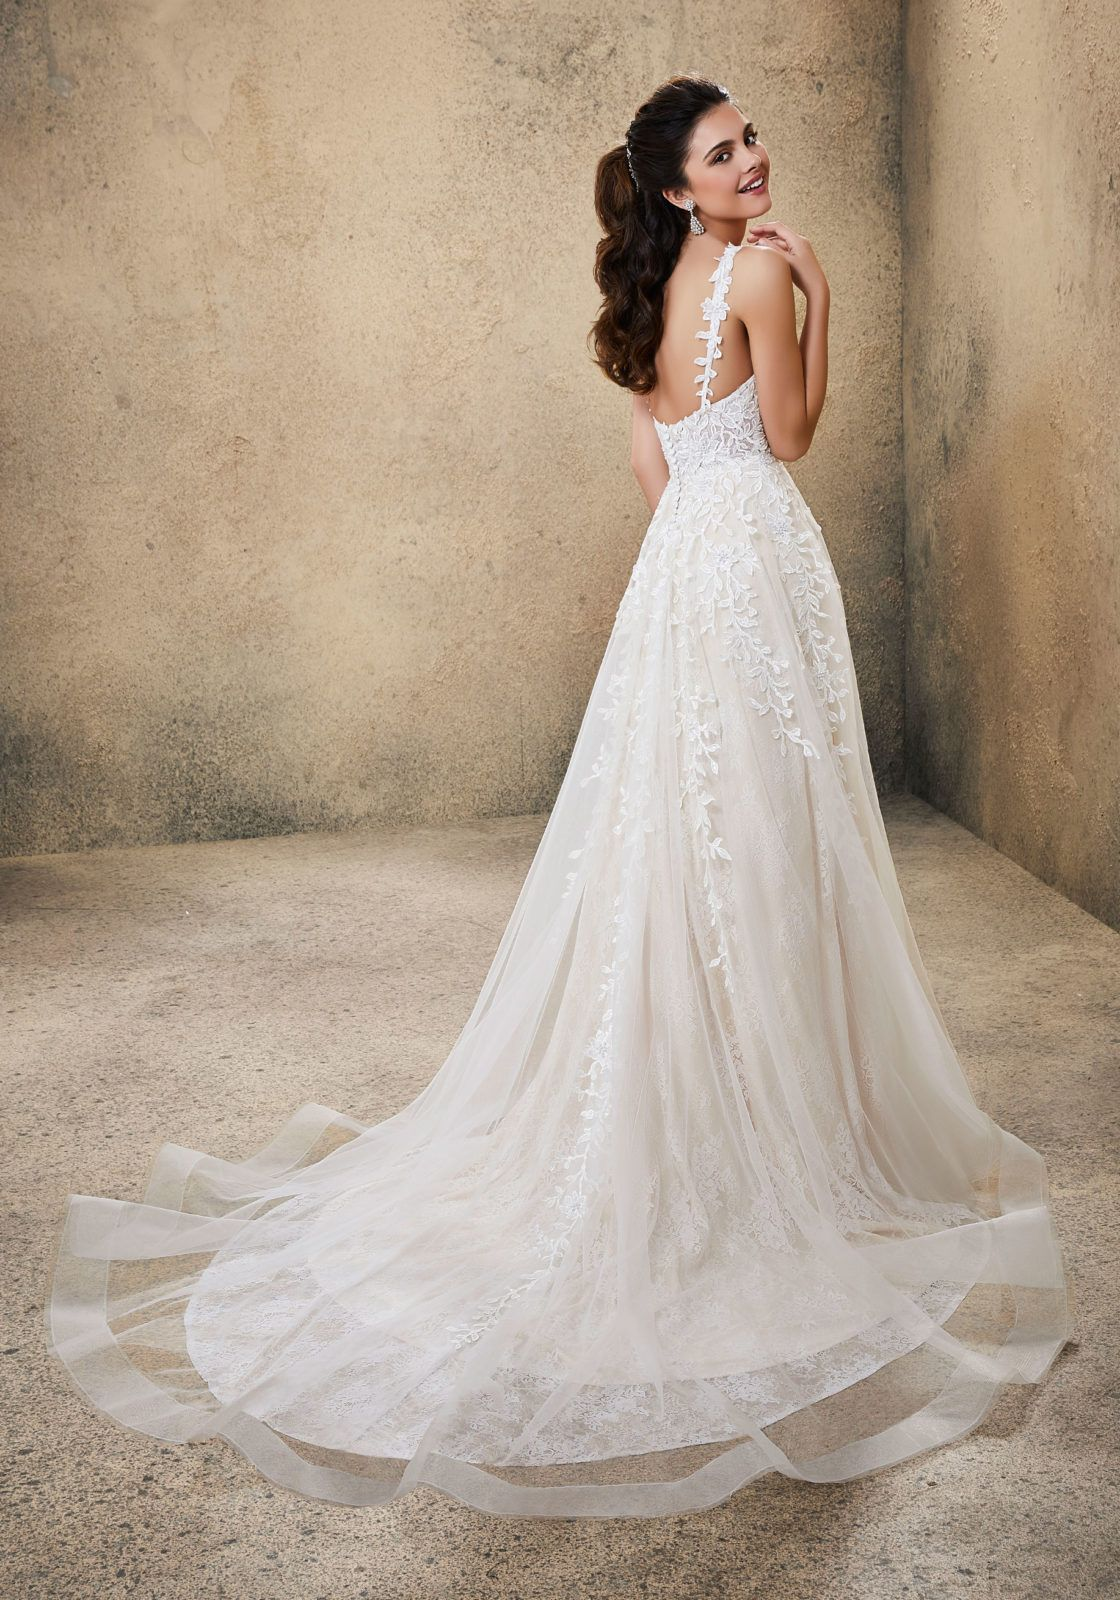 River Wedding Dress Morilee Wedding Dress Styles Wedding